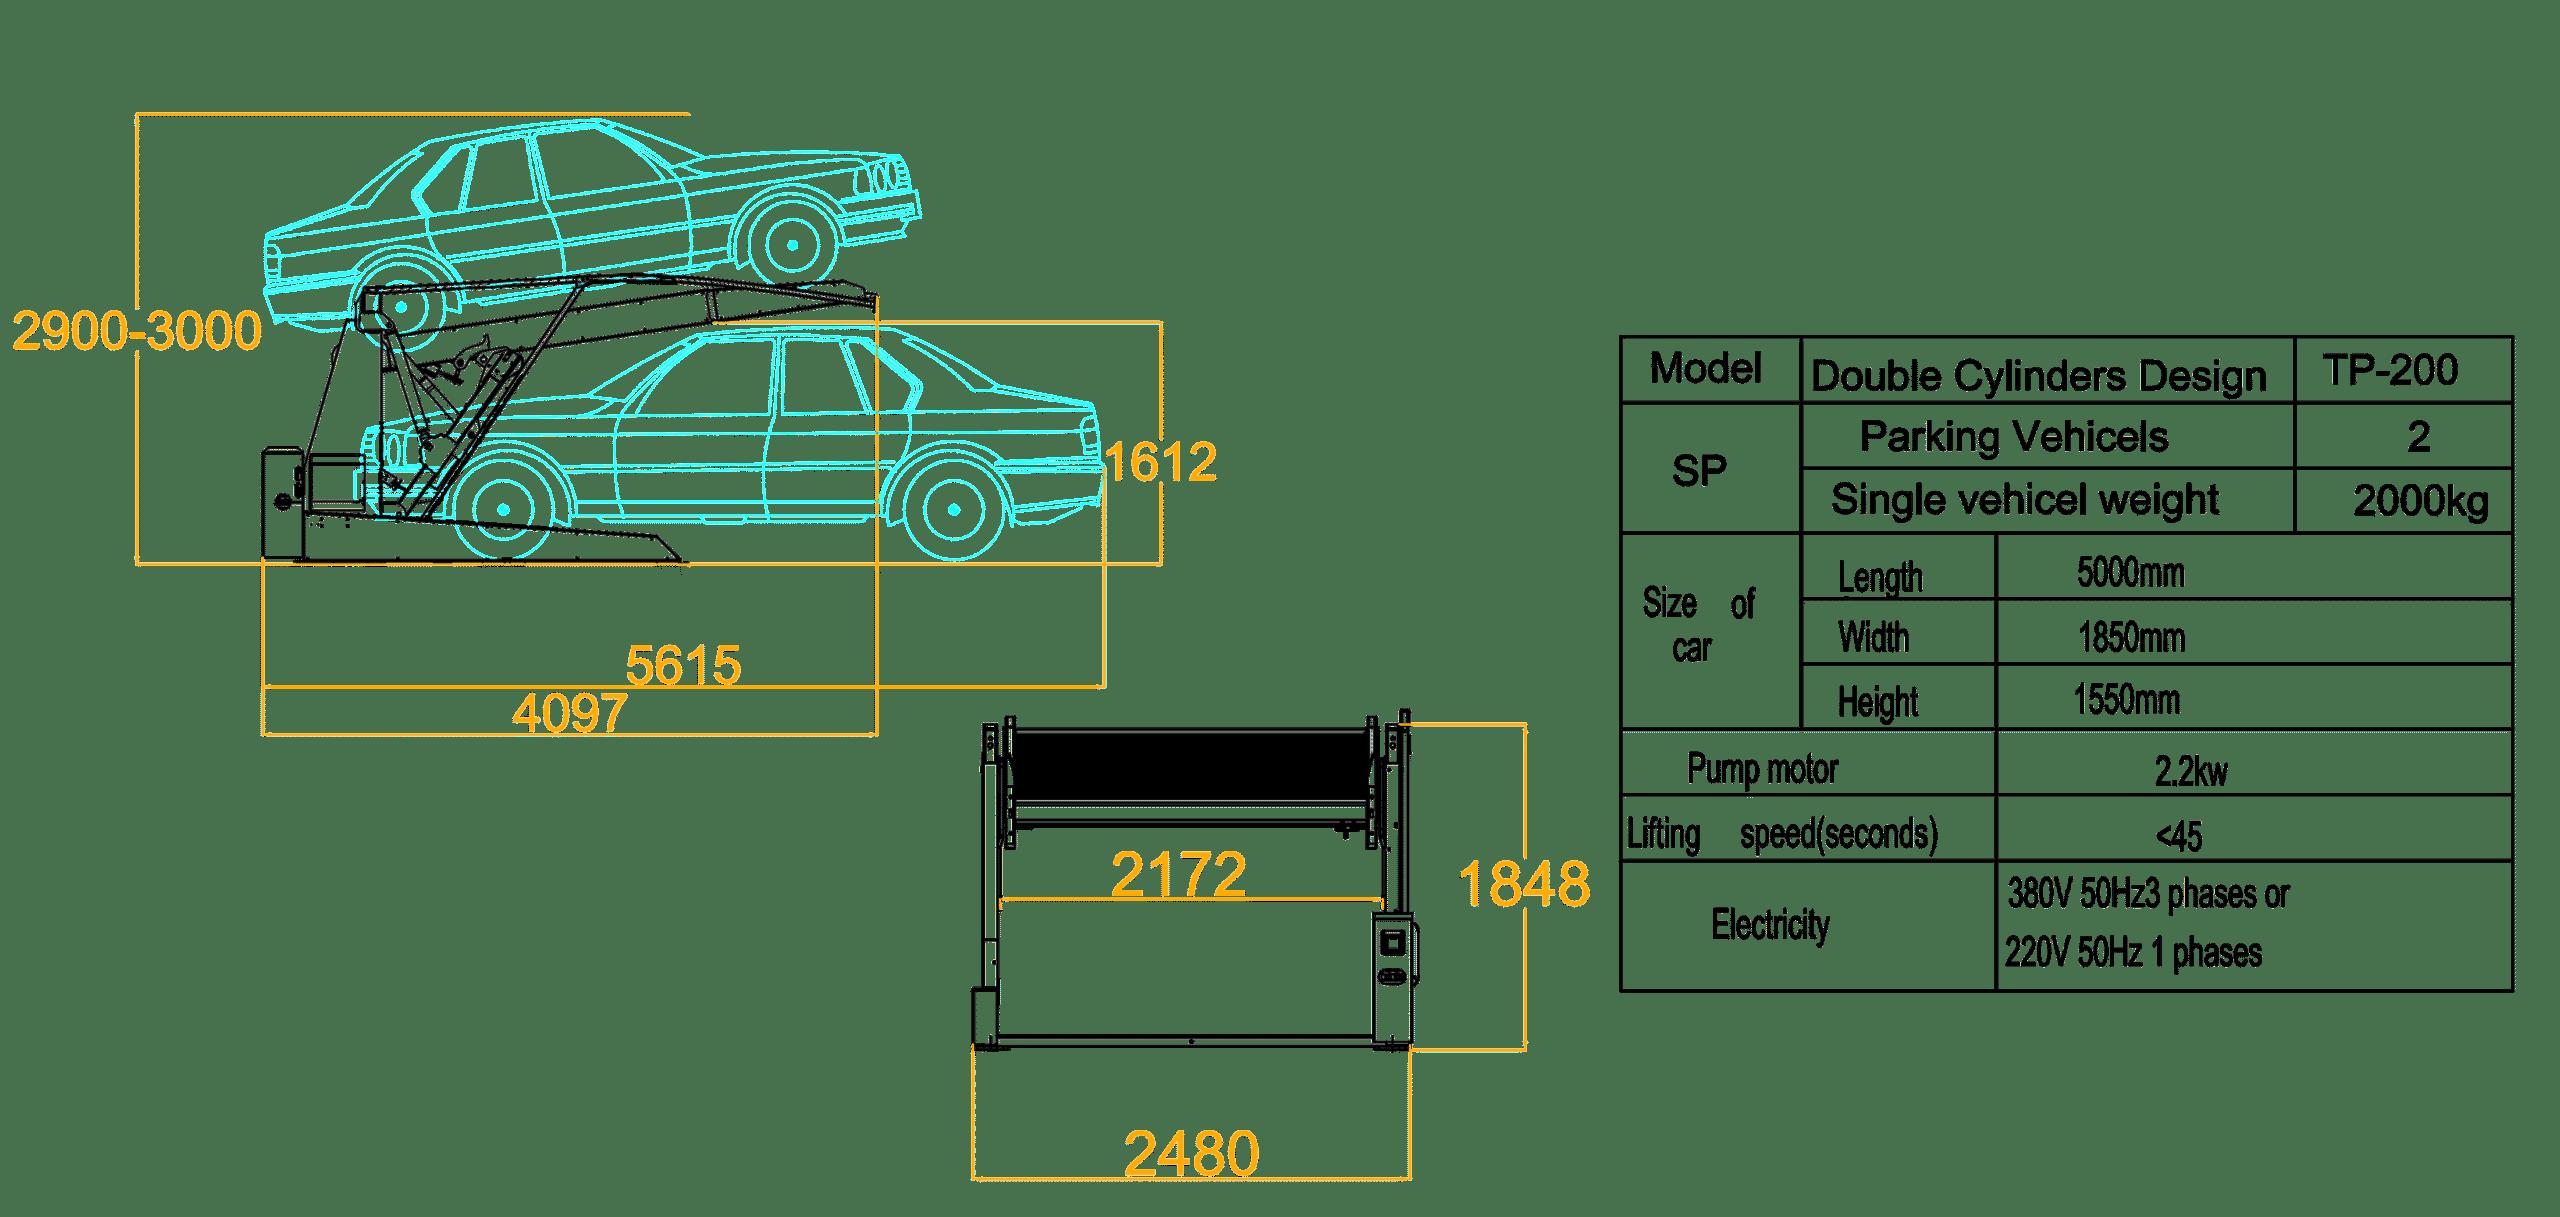 TP-200